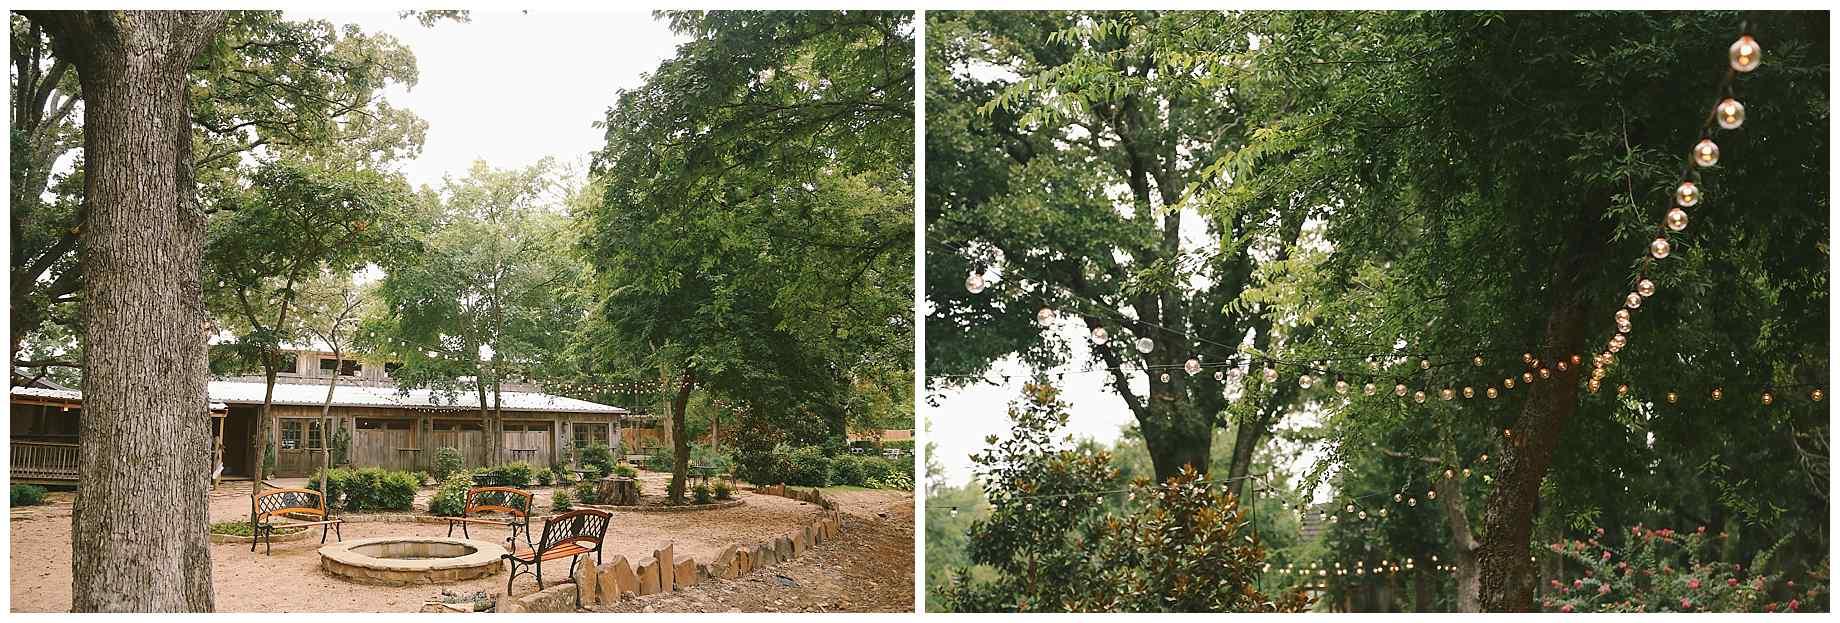 stone-oak-ranch-outdoor-wedding-005